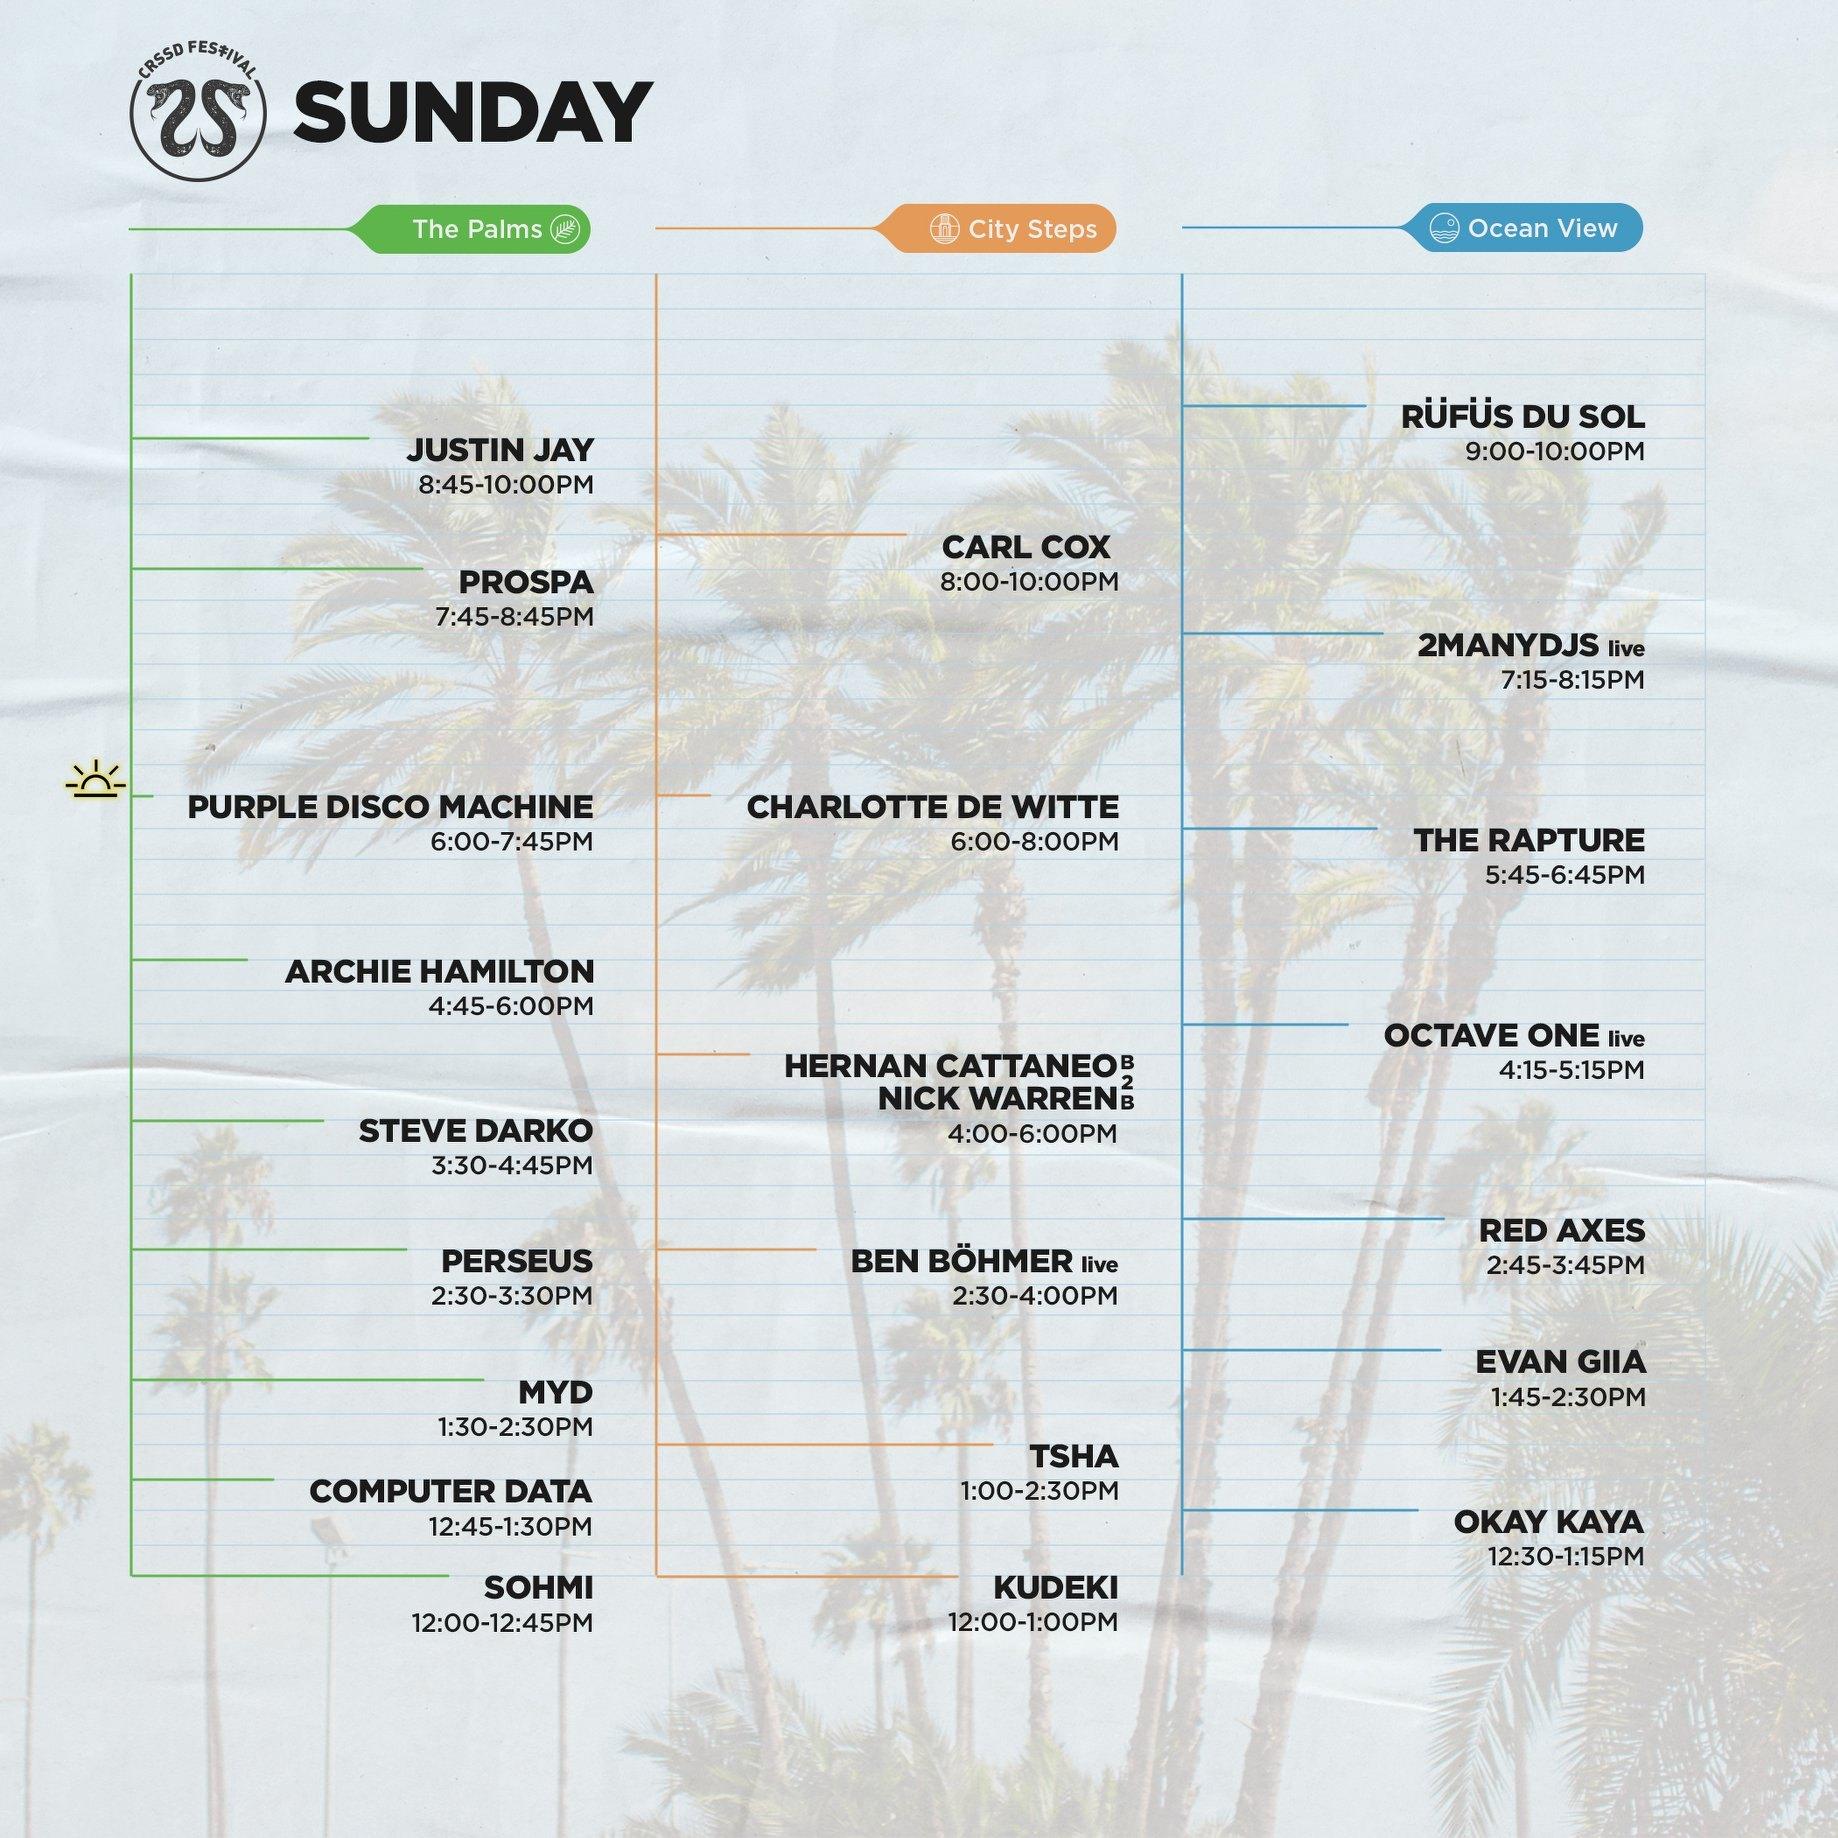 CRSSD Festival Spring 2020 - Sunday